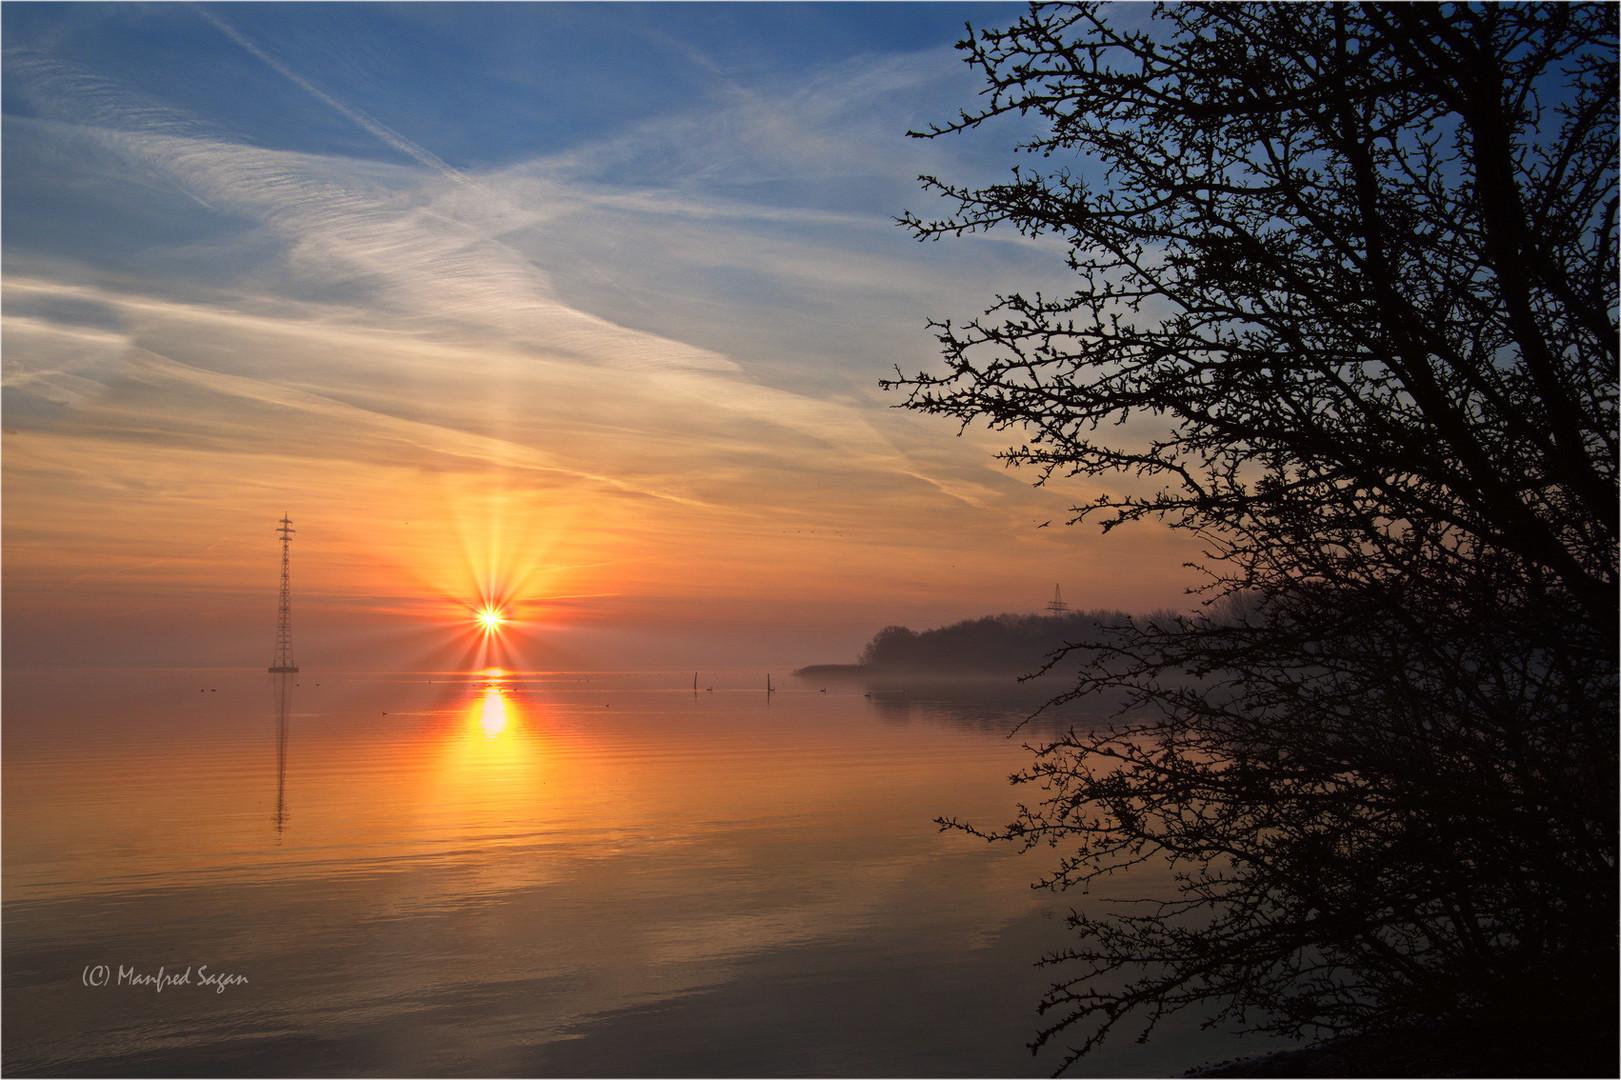 Sonnenaufgang am Strelasund